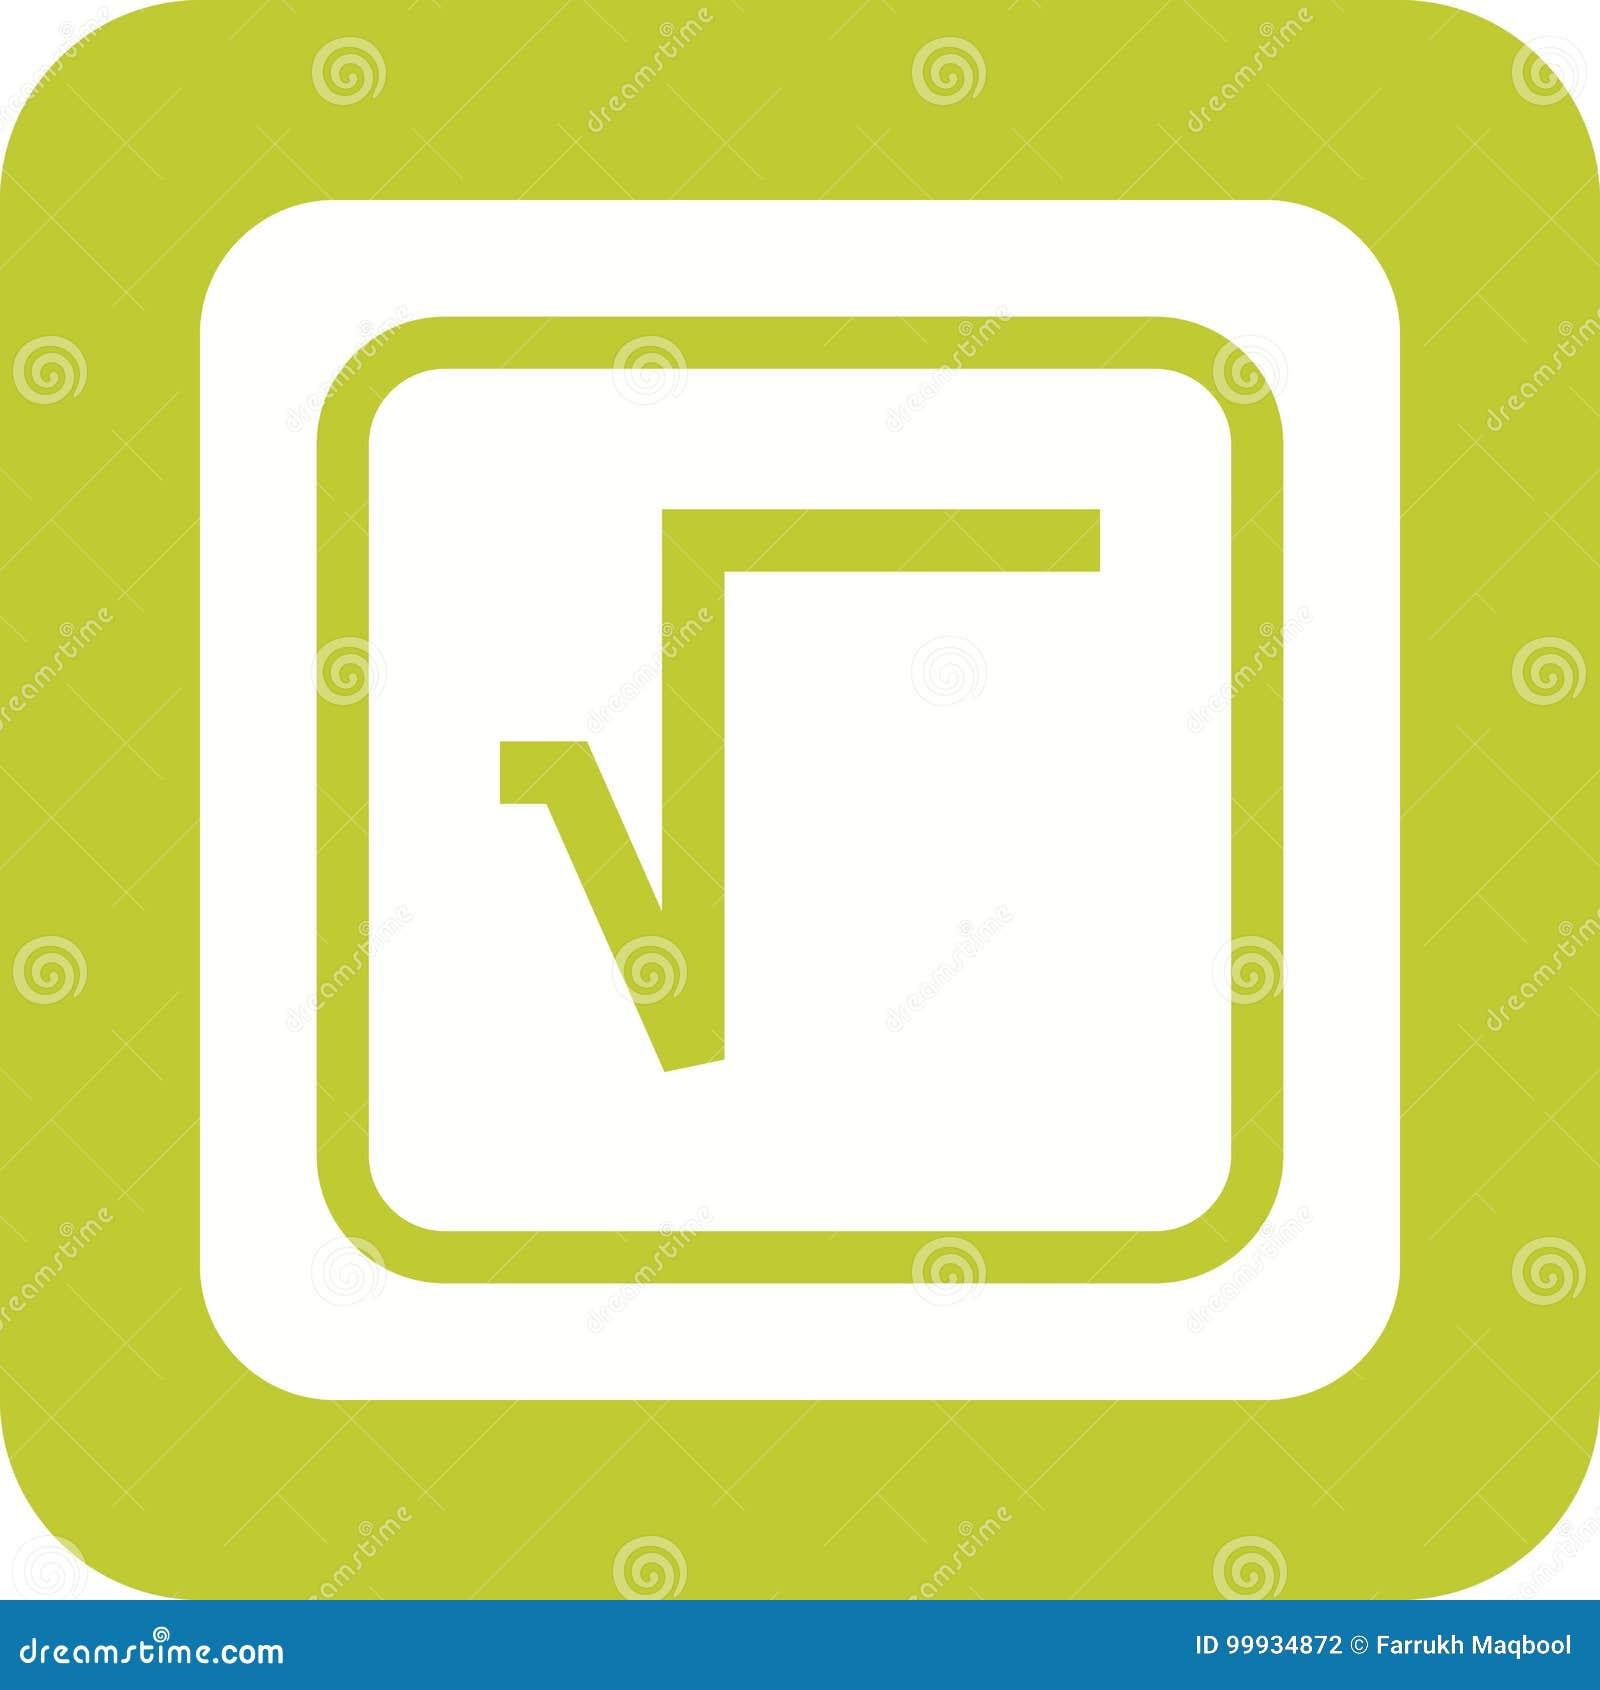 Square Root Symbol Stock Vector Illustration Of Algebra 99934872